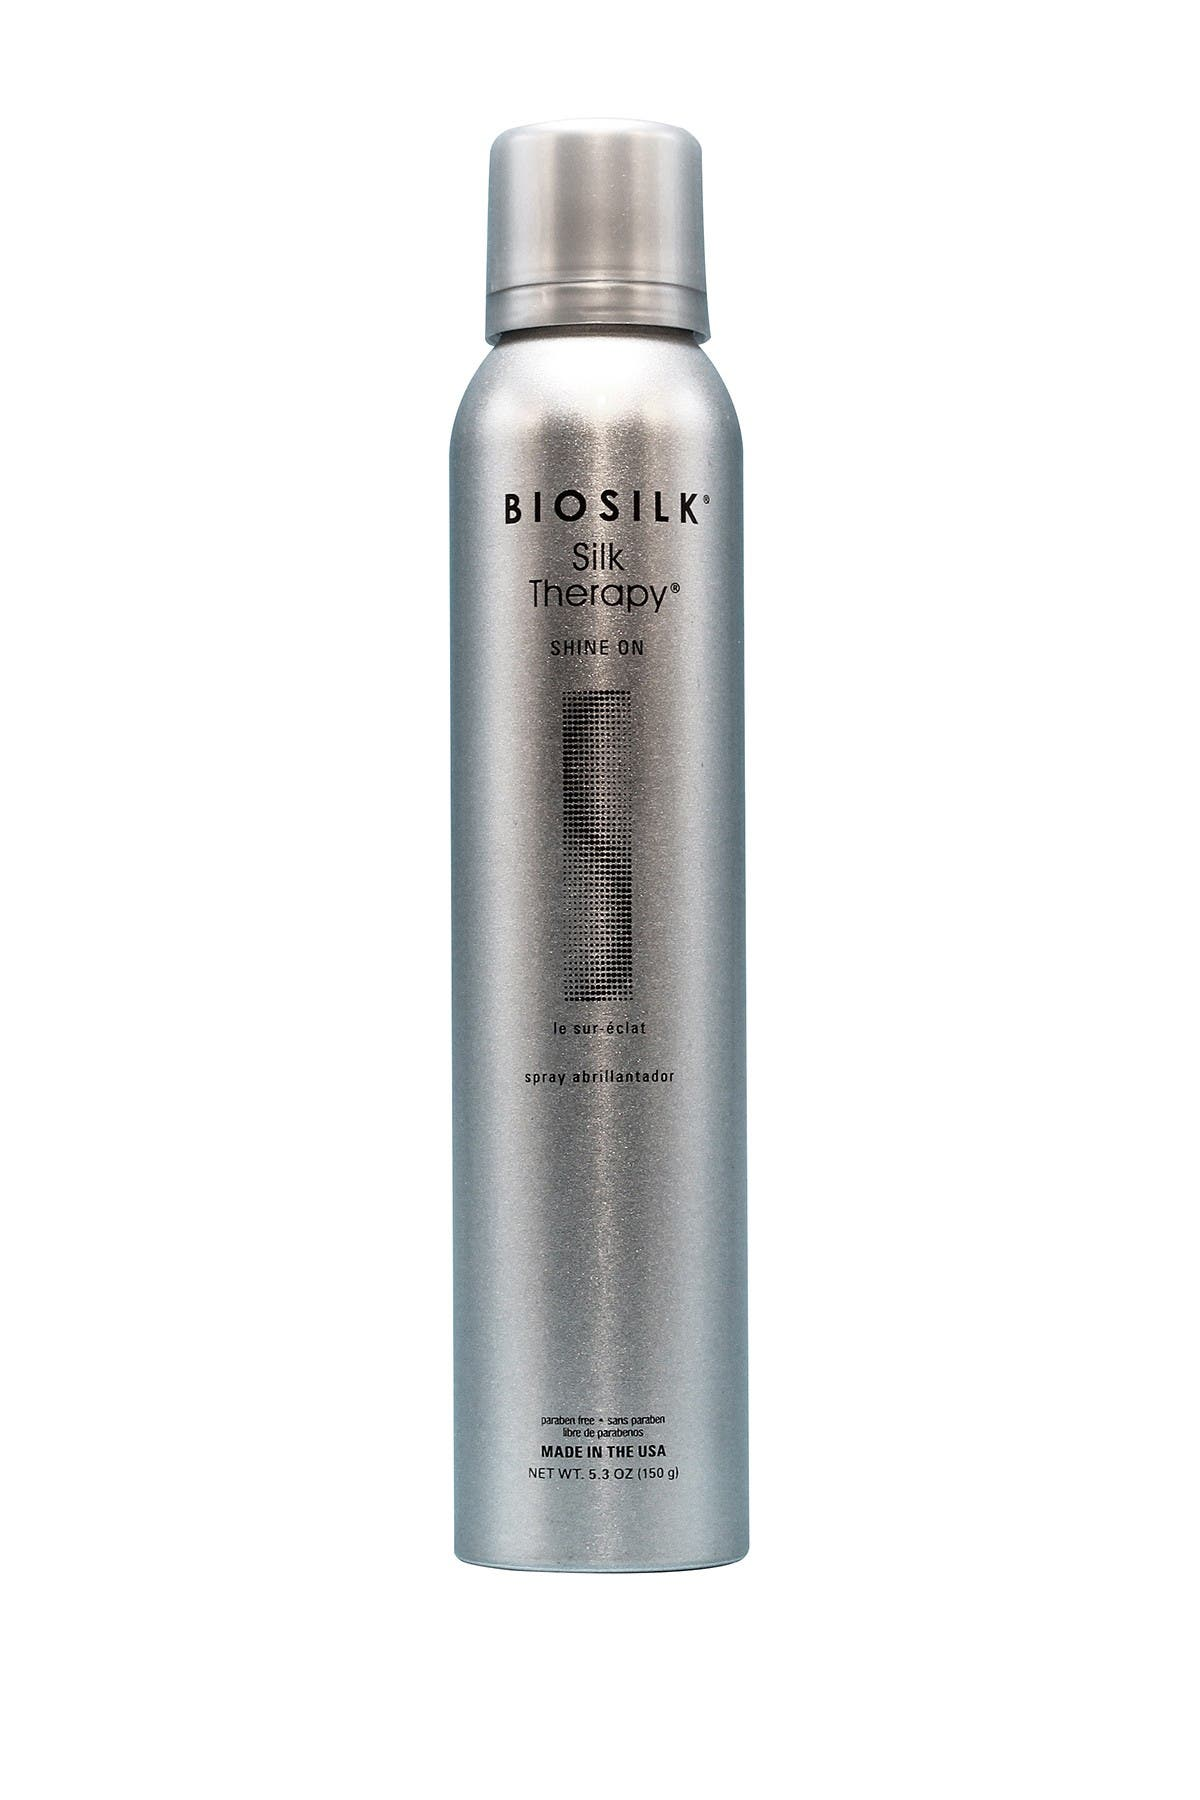 Image of Biosilk Silk Therapy Shine On Spray - 5.3 oz.